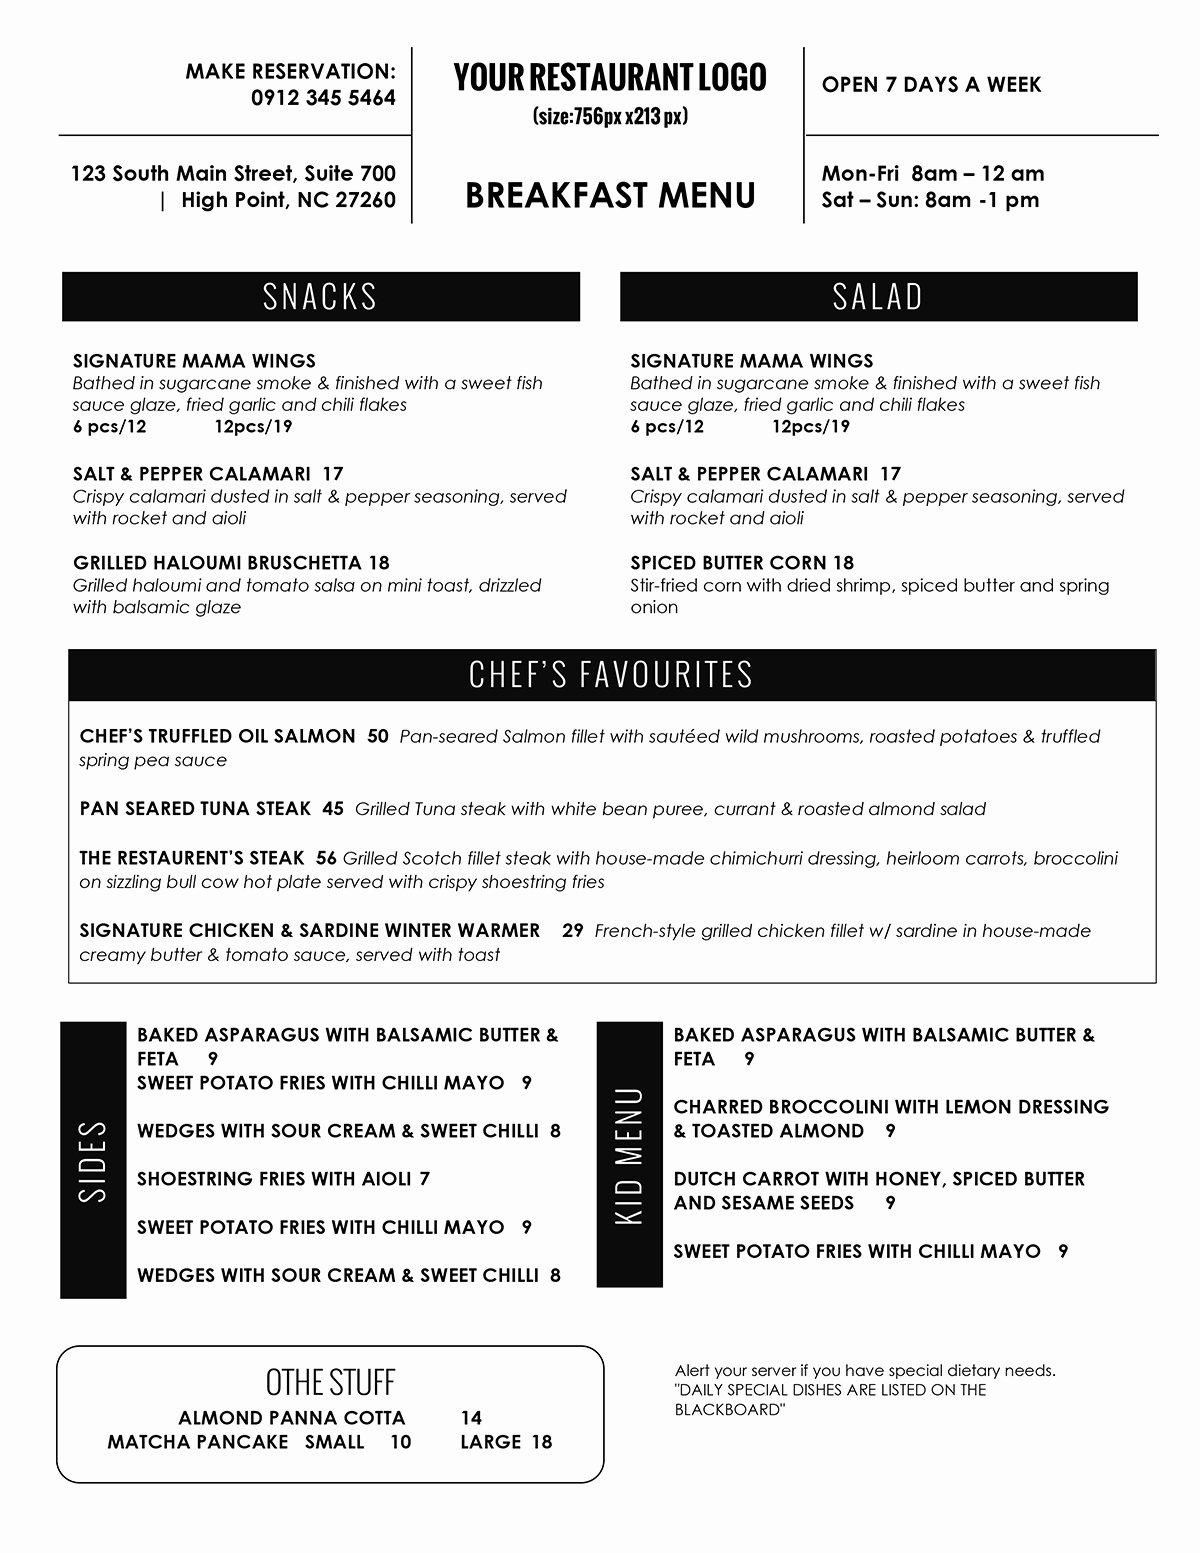 Restaurant Menu Template Word New Design & Templates Menu Templates Wedding Menu Food